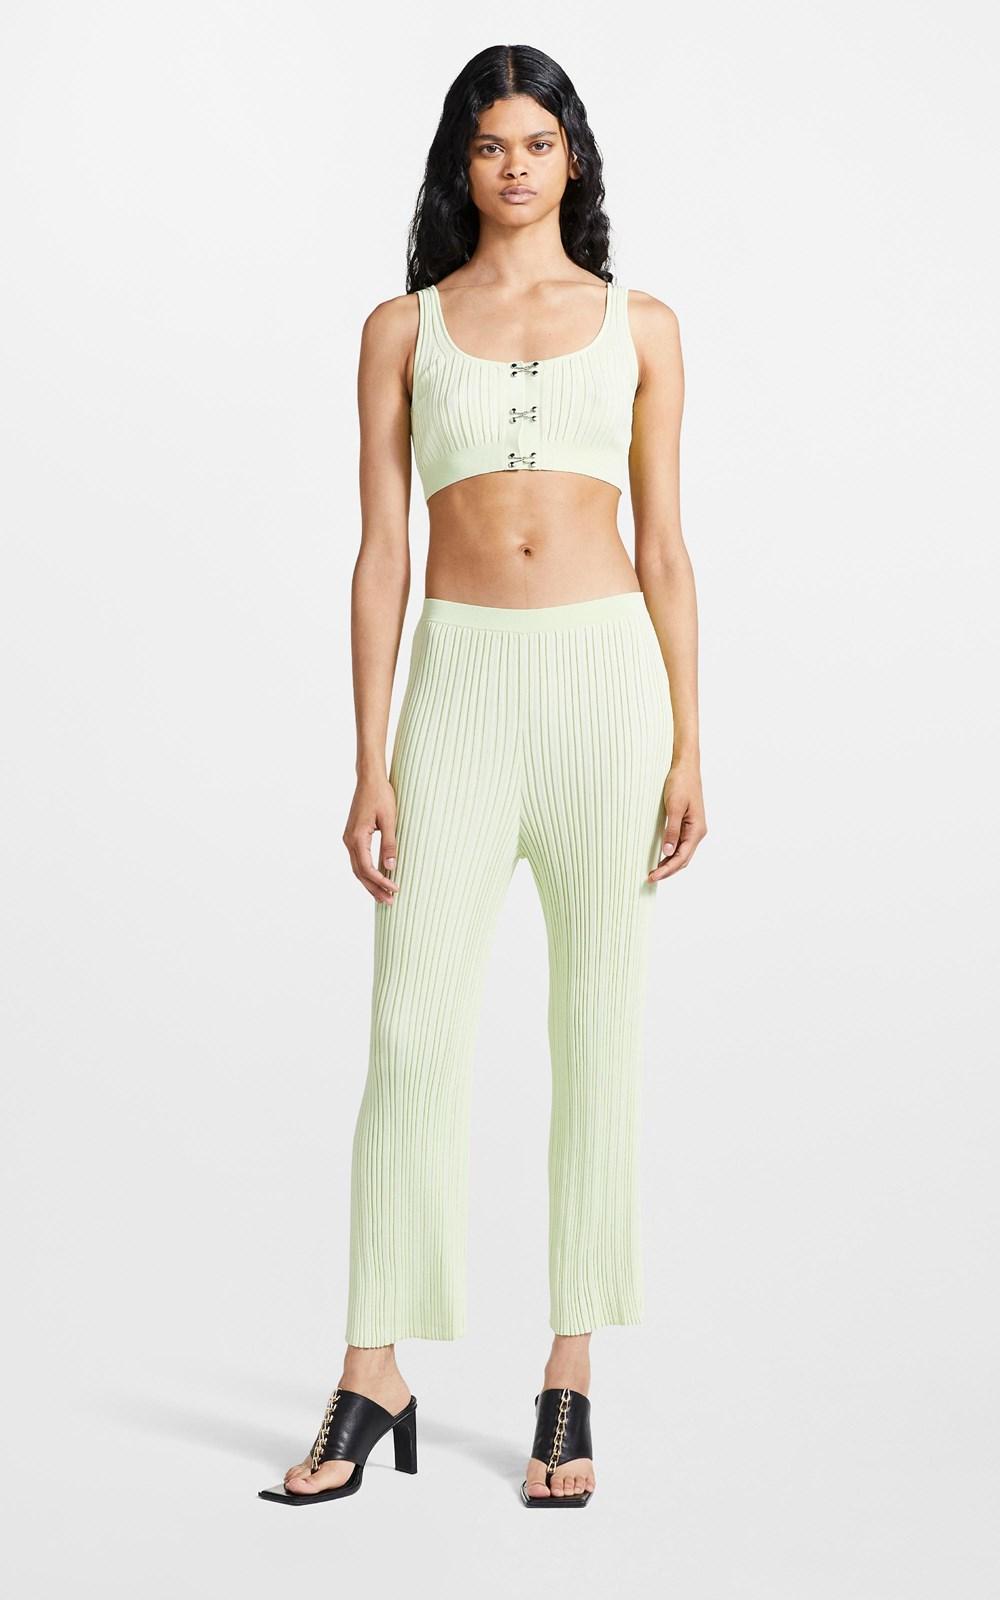 Knitwear | FLOAT RIB PANT